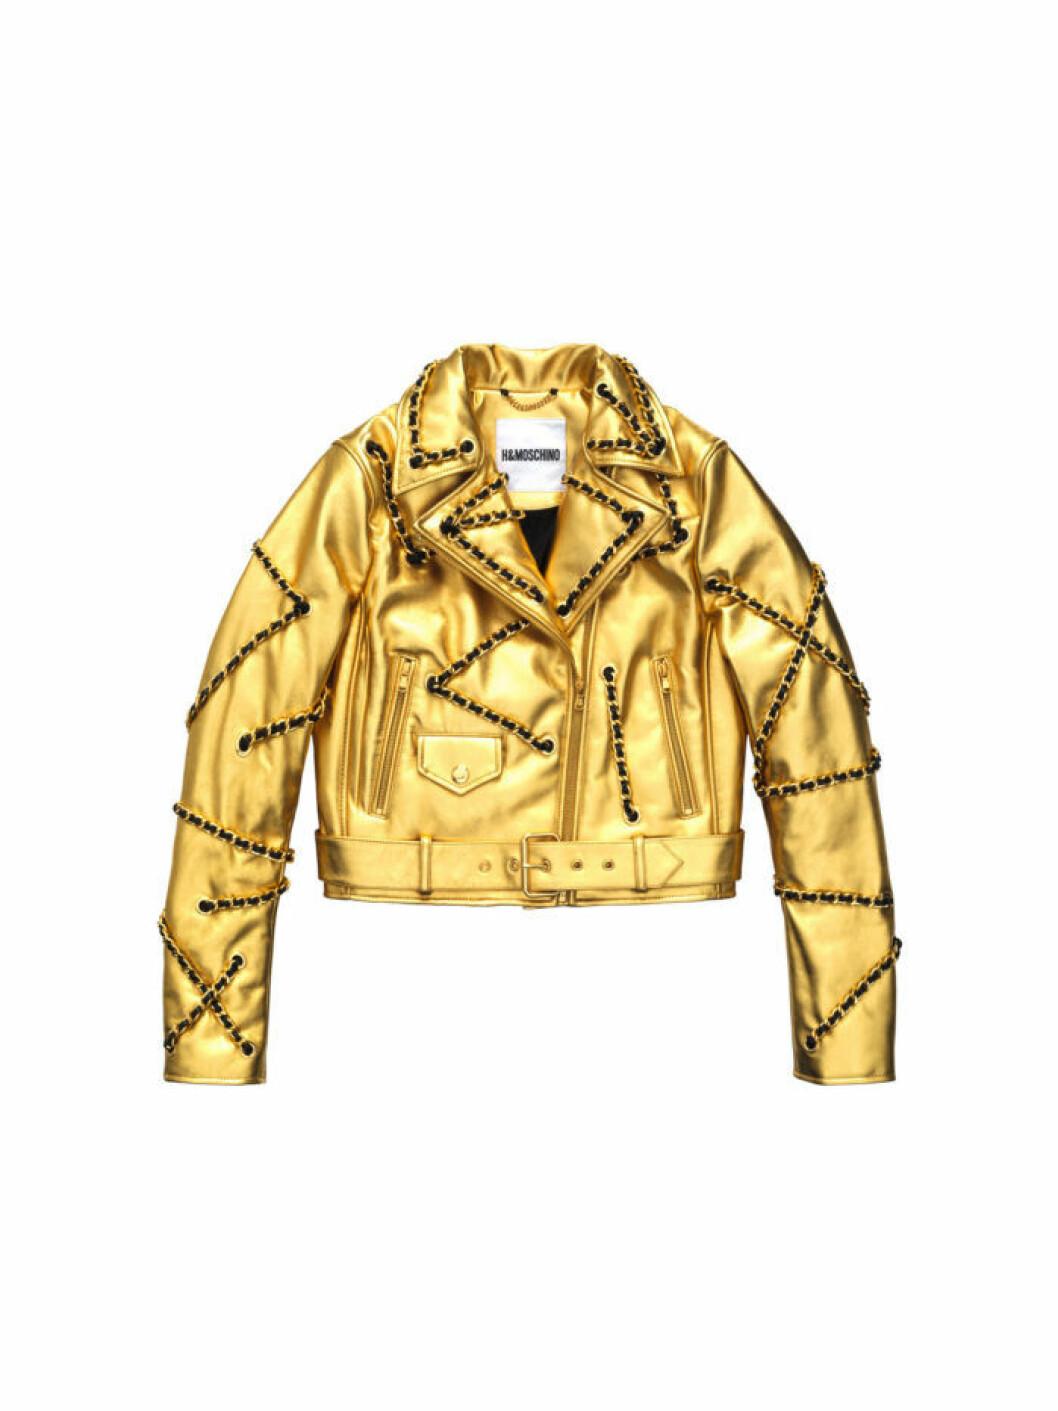 Guldig croppad skinnjacka med guldkedjor Moschino [tv] H&M